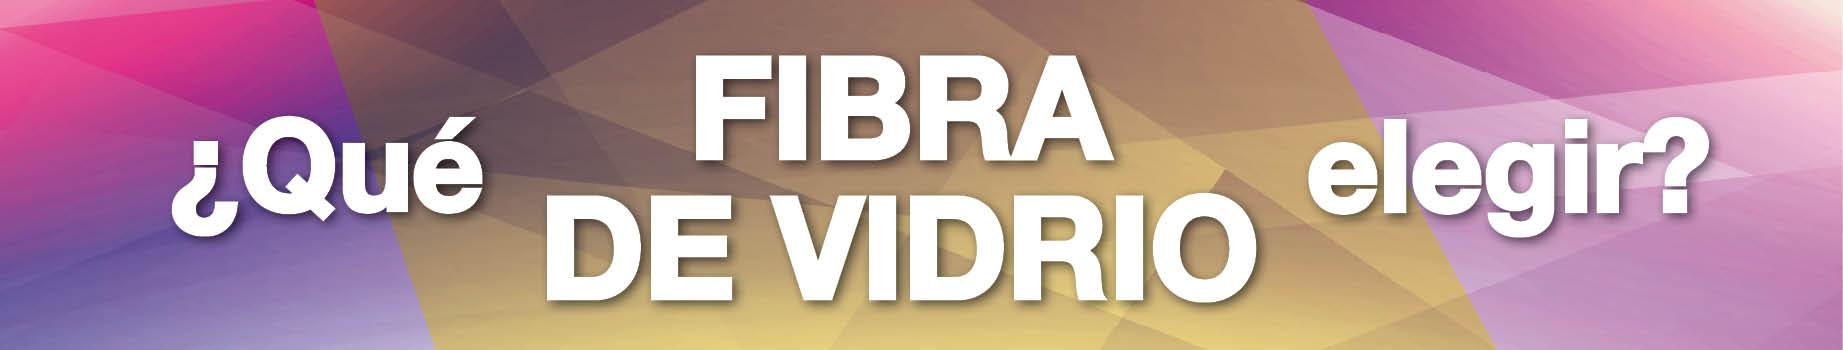 En Nazza te ayudamos a elegir Fibra de Vidrio+